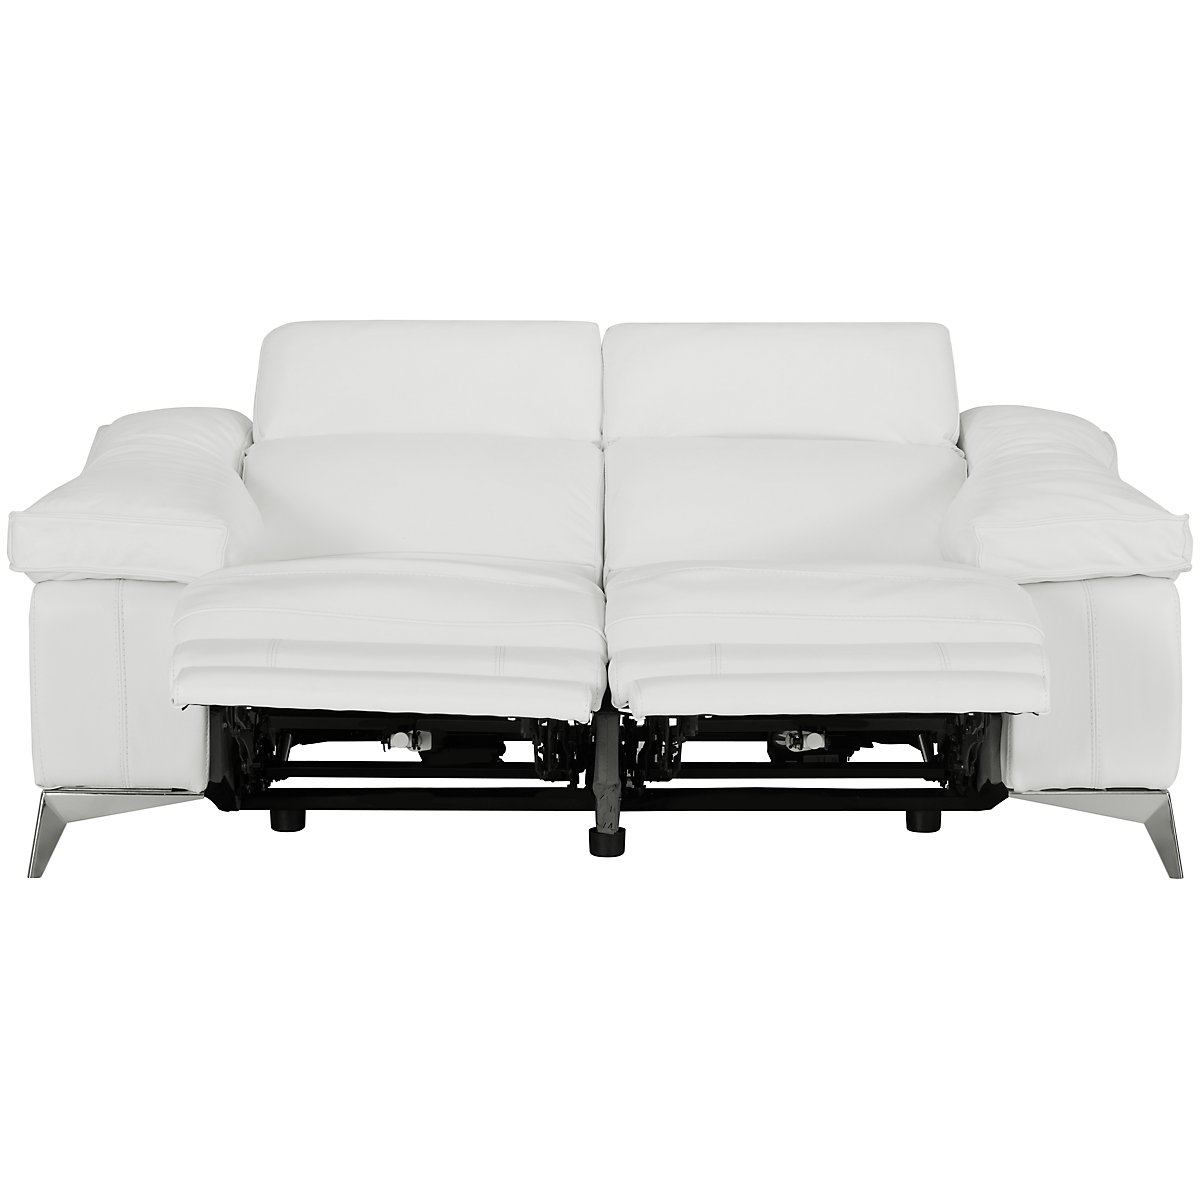 city furniture luca white leather  vinyl power reclining loveseat - luca white leather  vinyl power reclining loveseat view larger